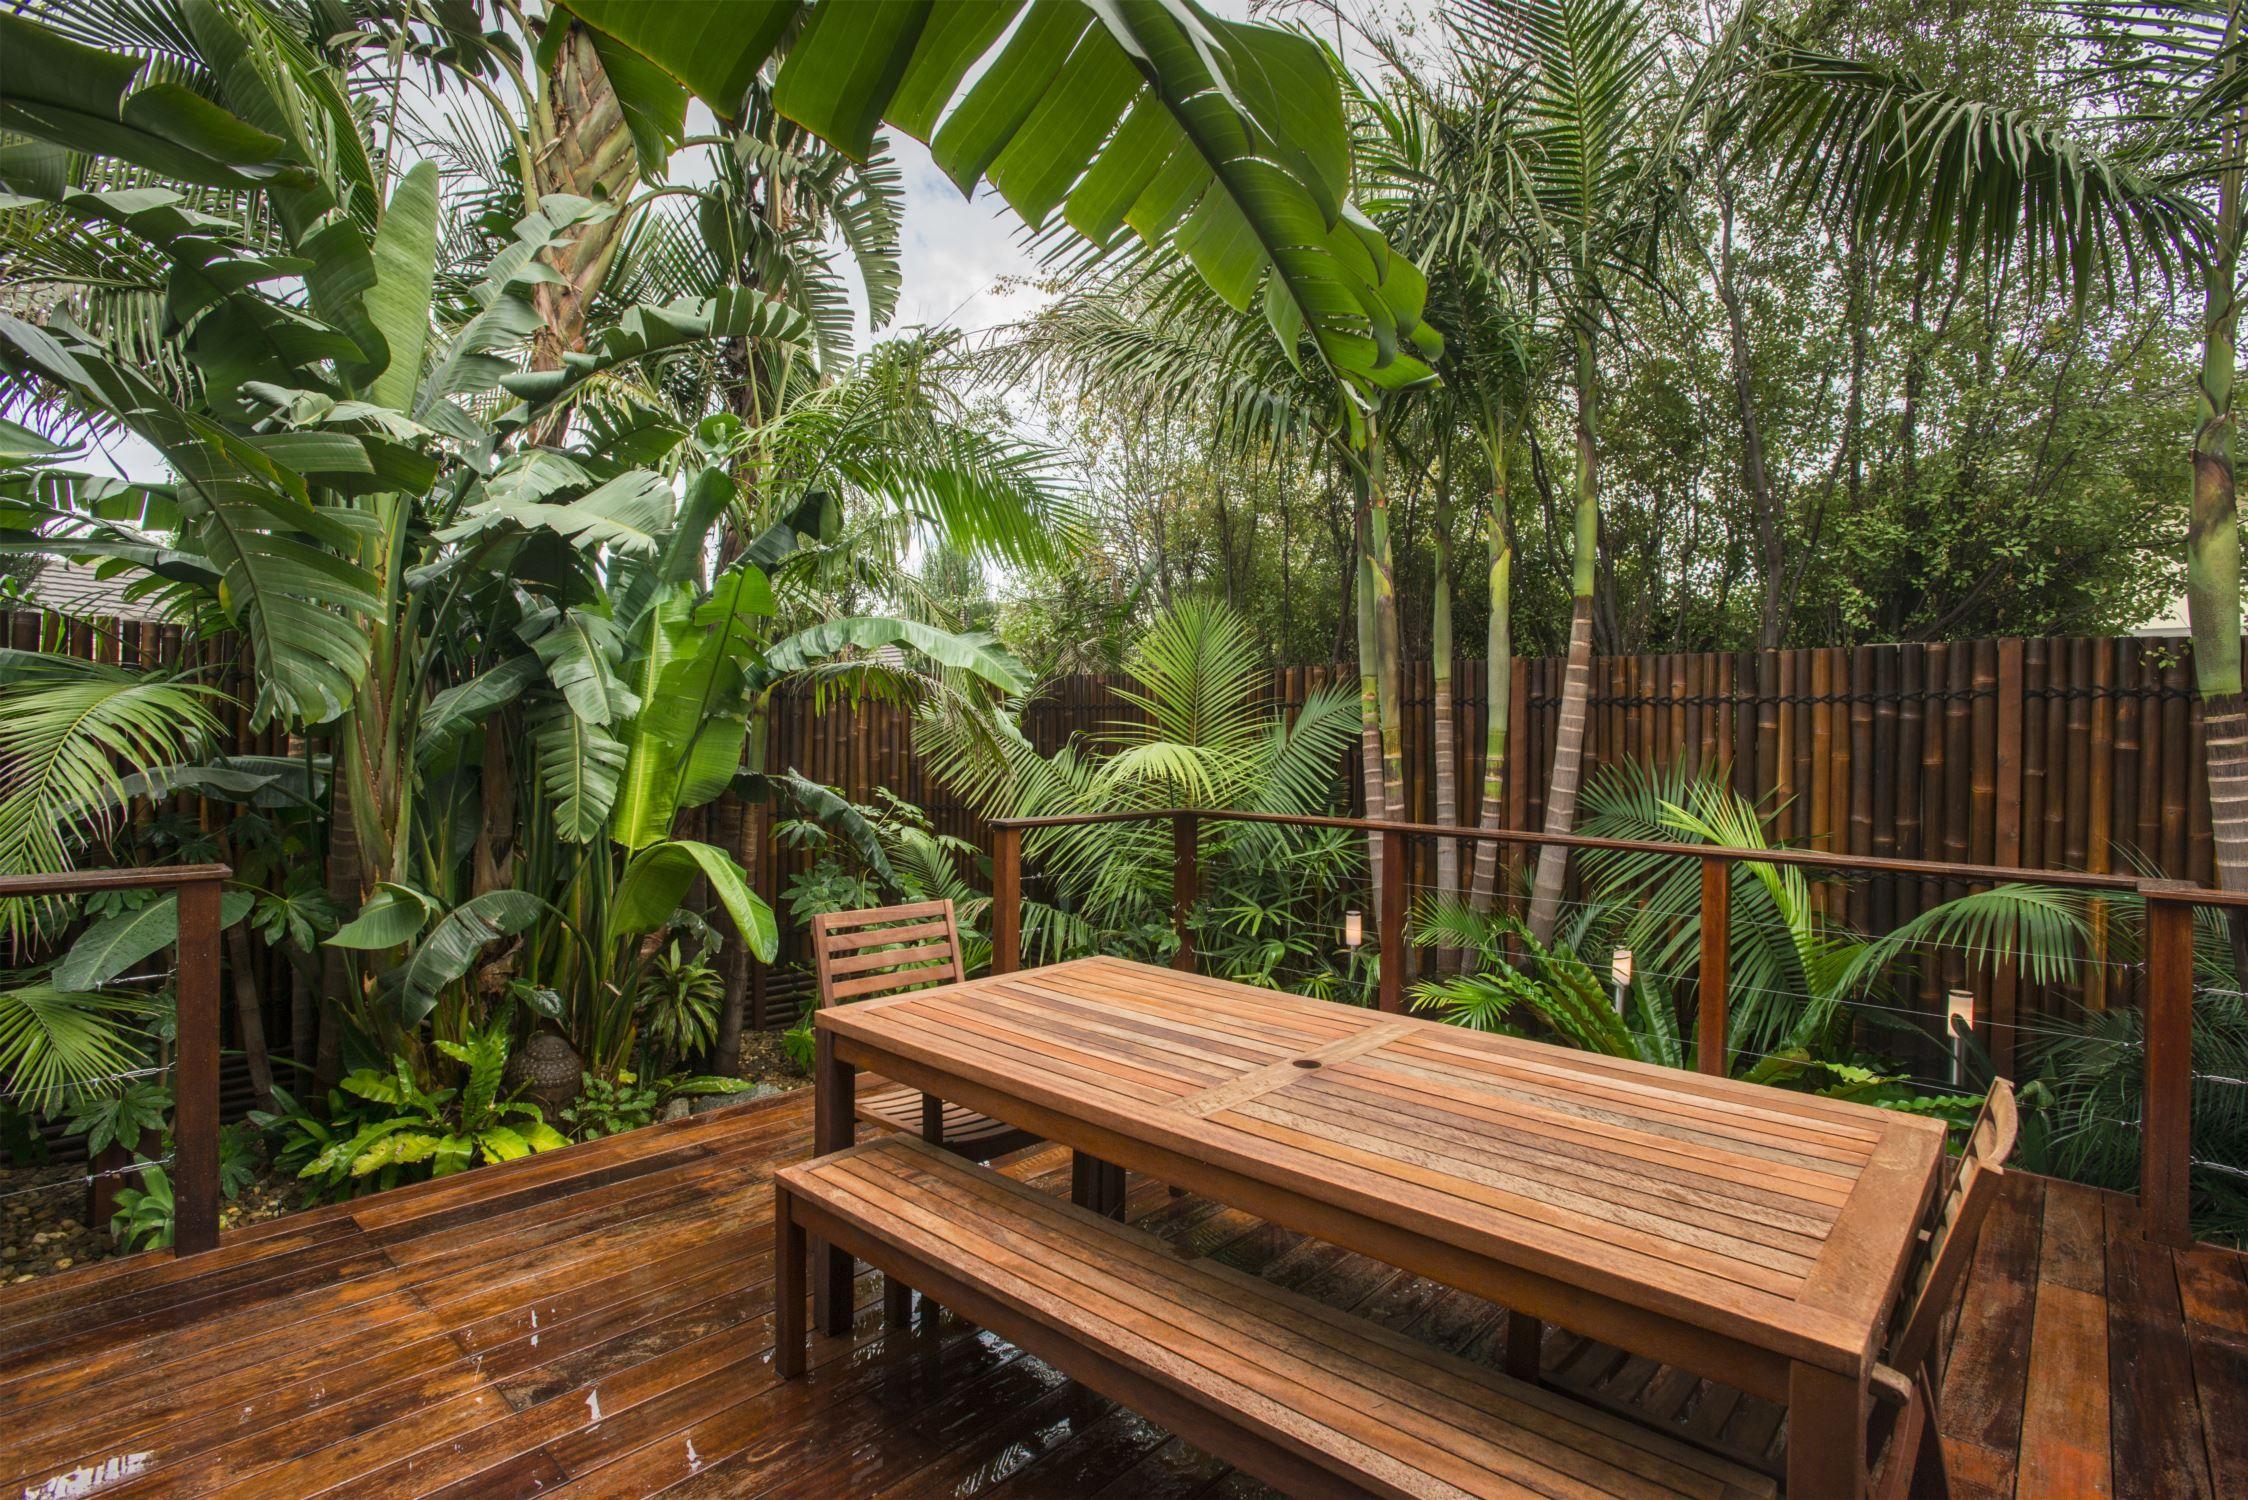 bali garden - Bing Images | Gardens Design | Pinterest | Bali garden ...